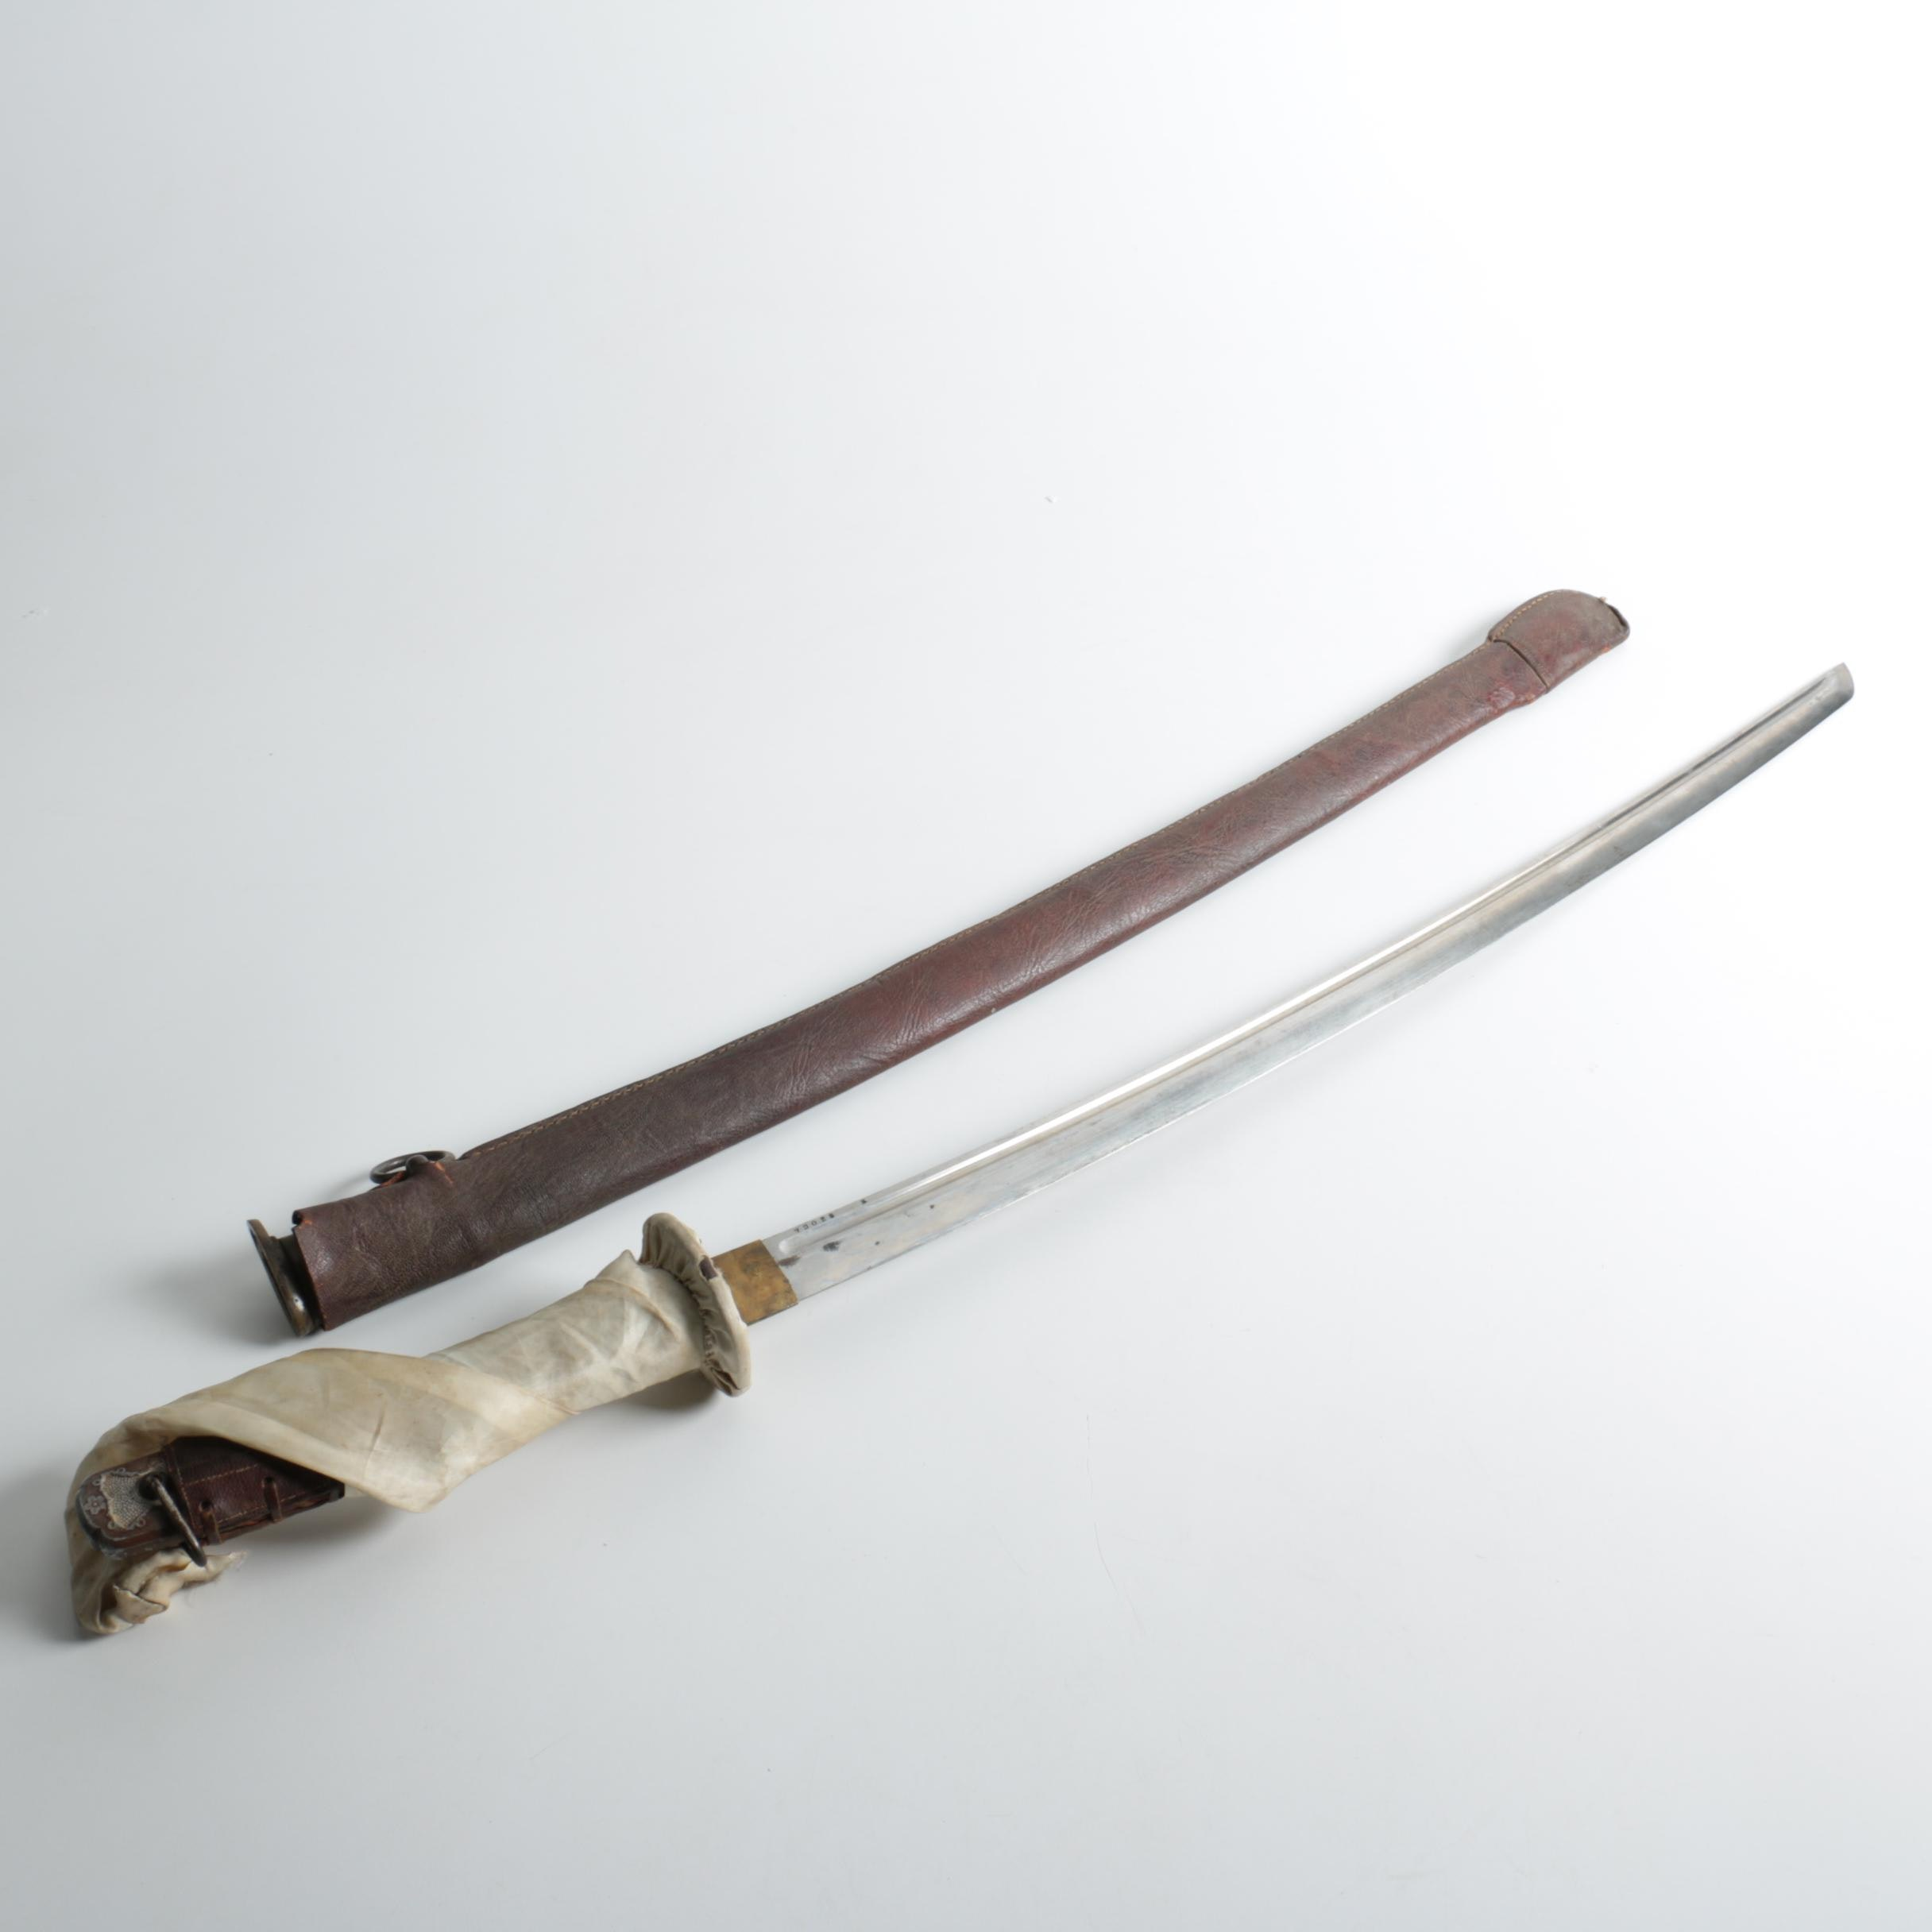 World War II Japanese NCO Shin Guntō Sword in Leather Wrapped Scabbard